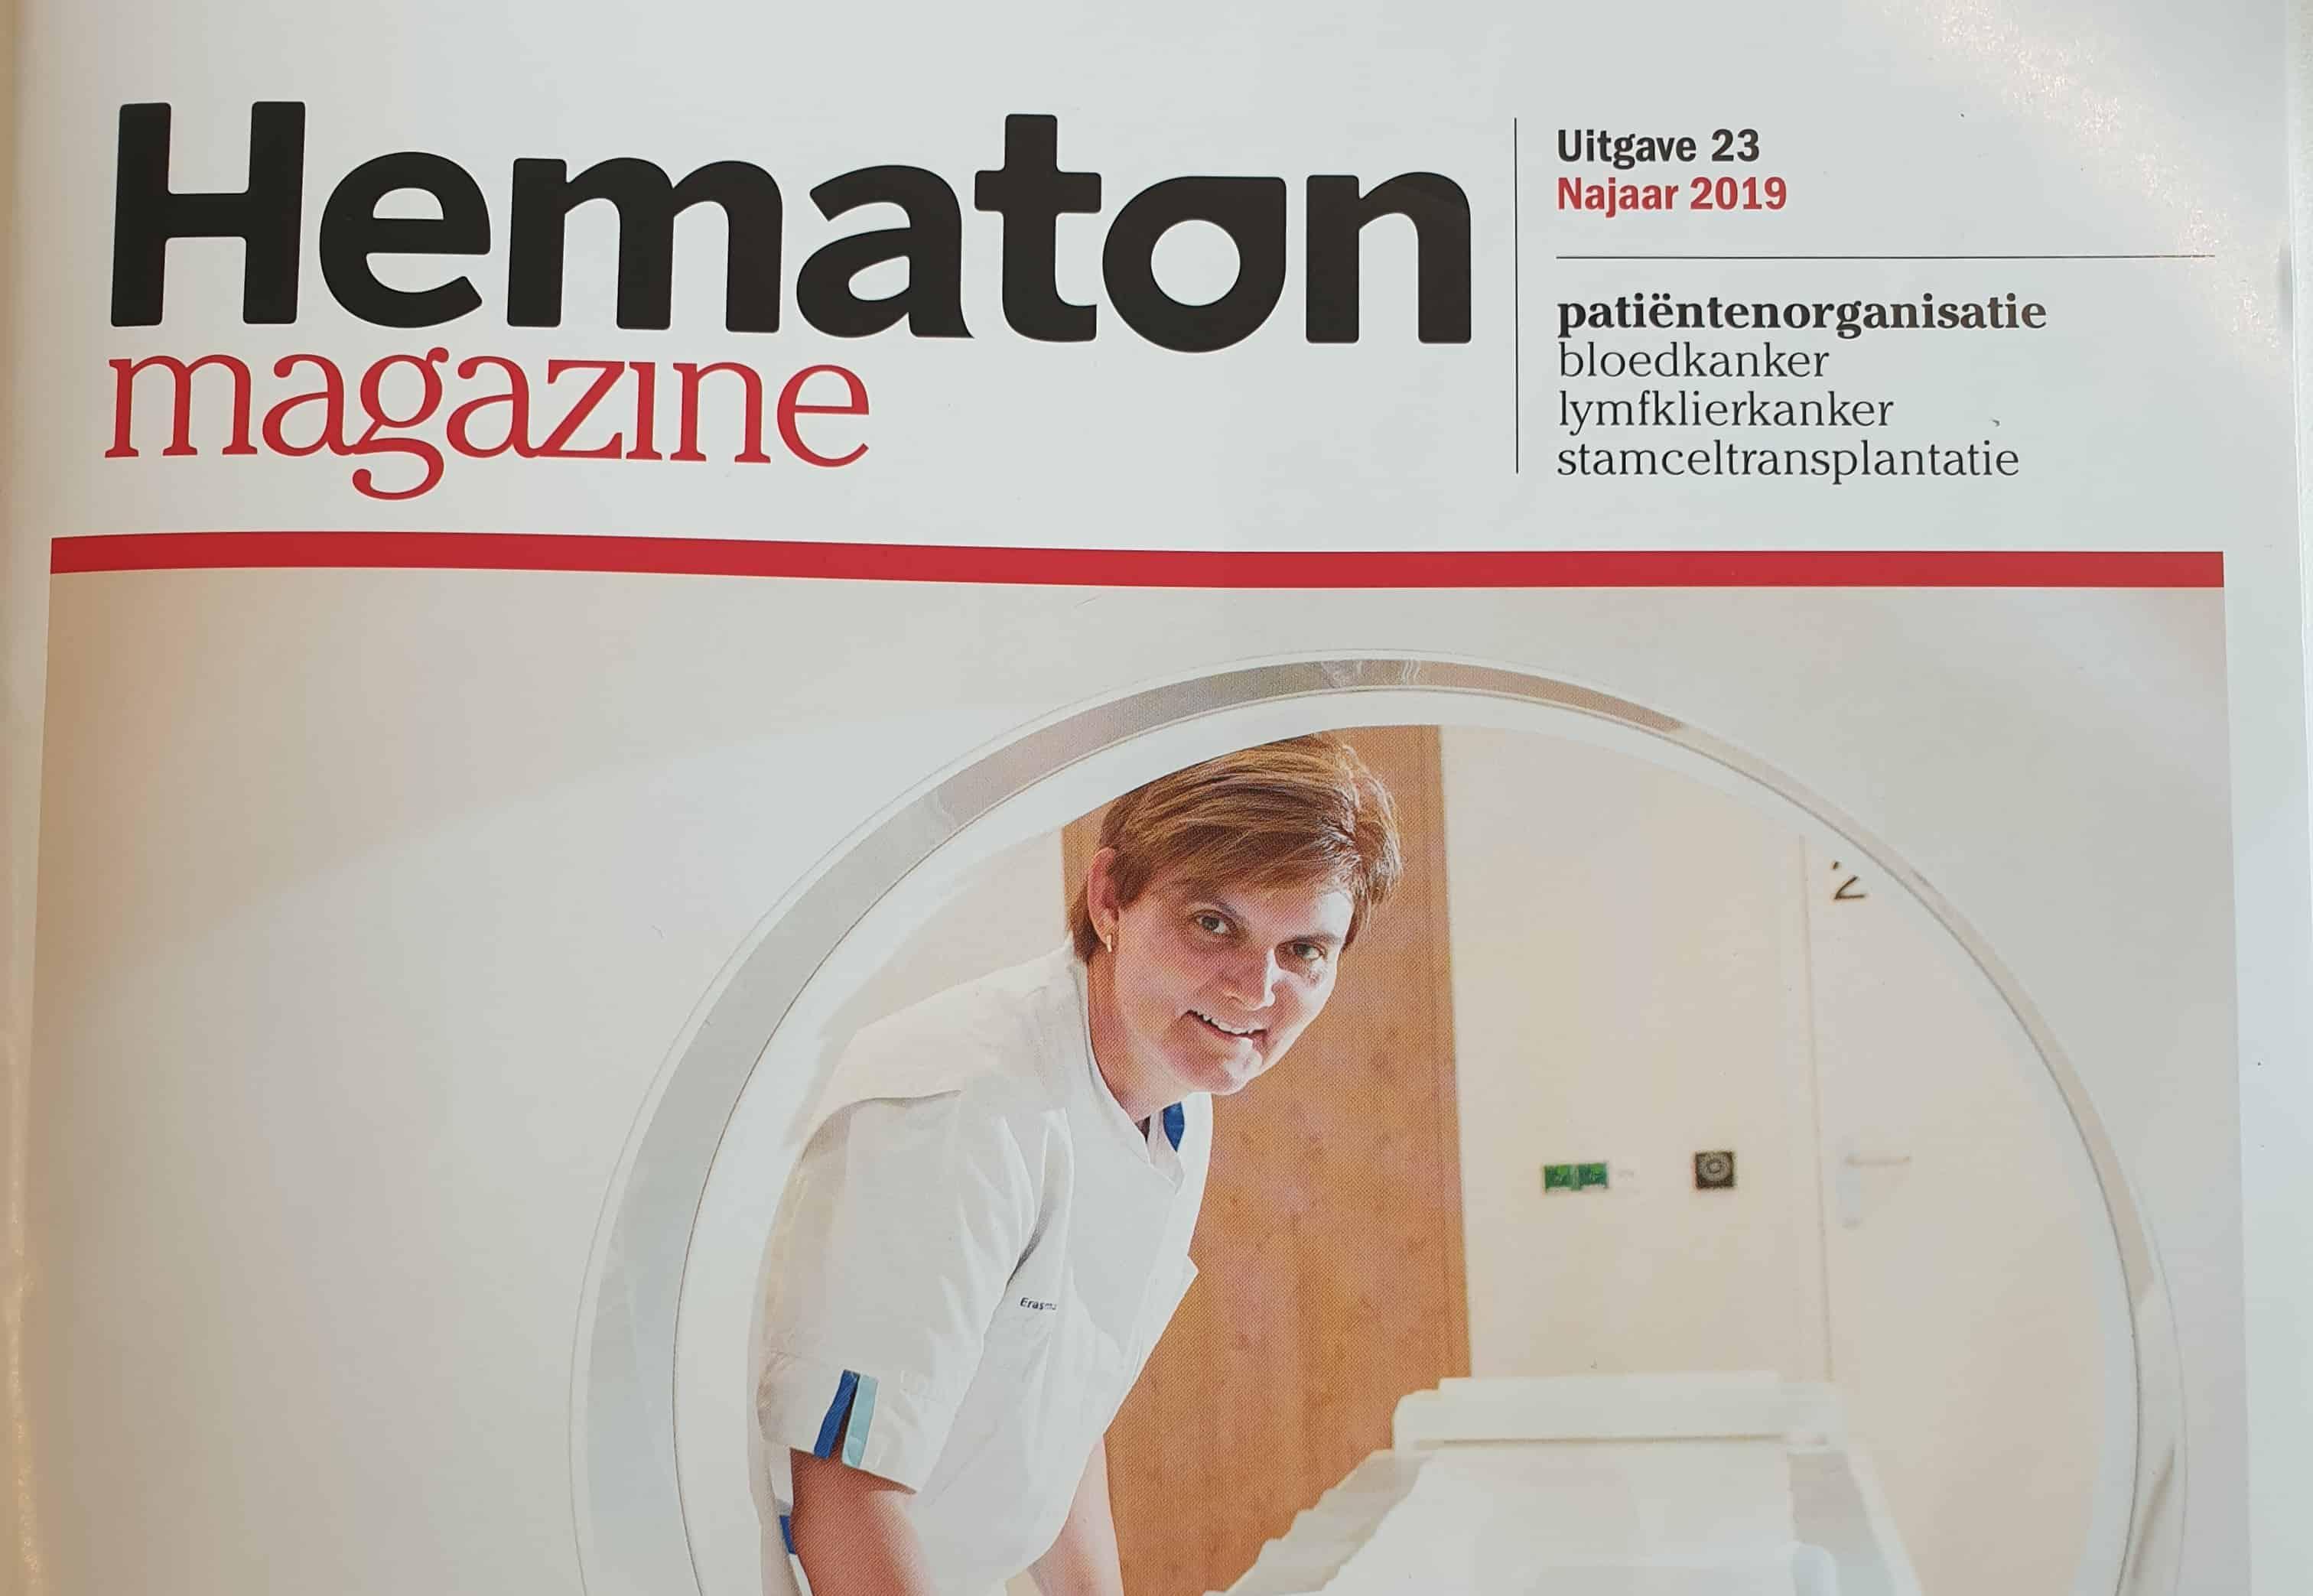 hematon magazine keuzehulp